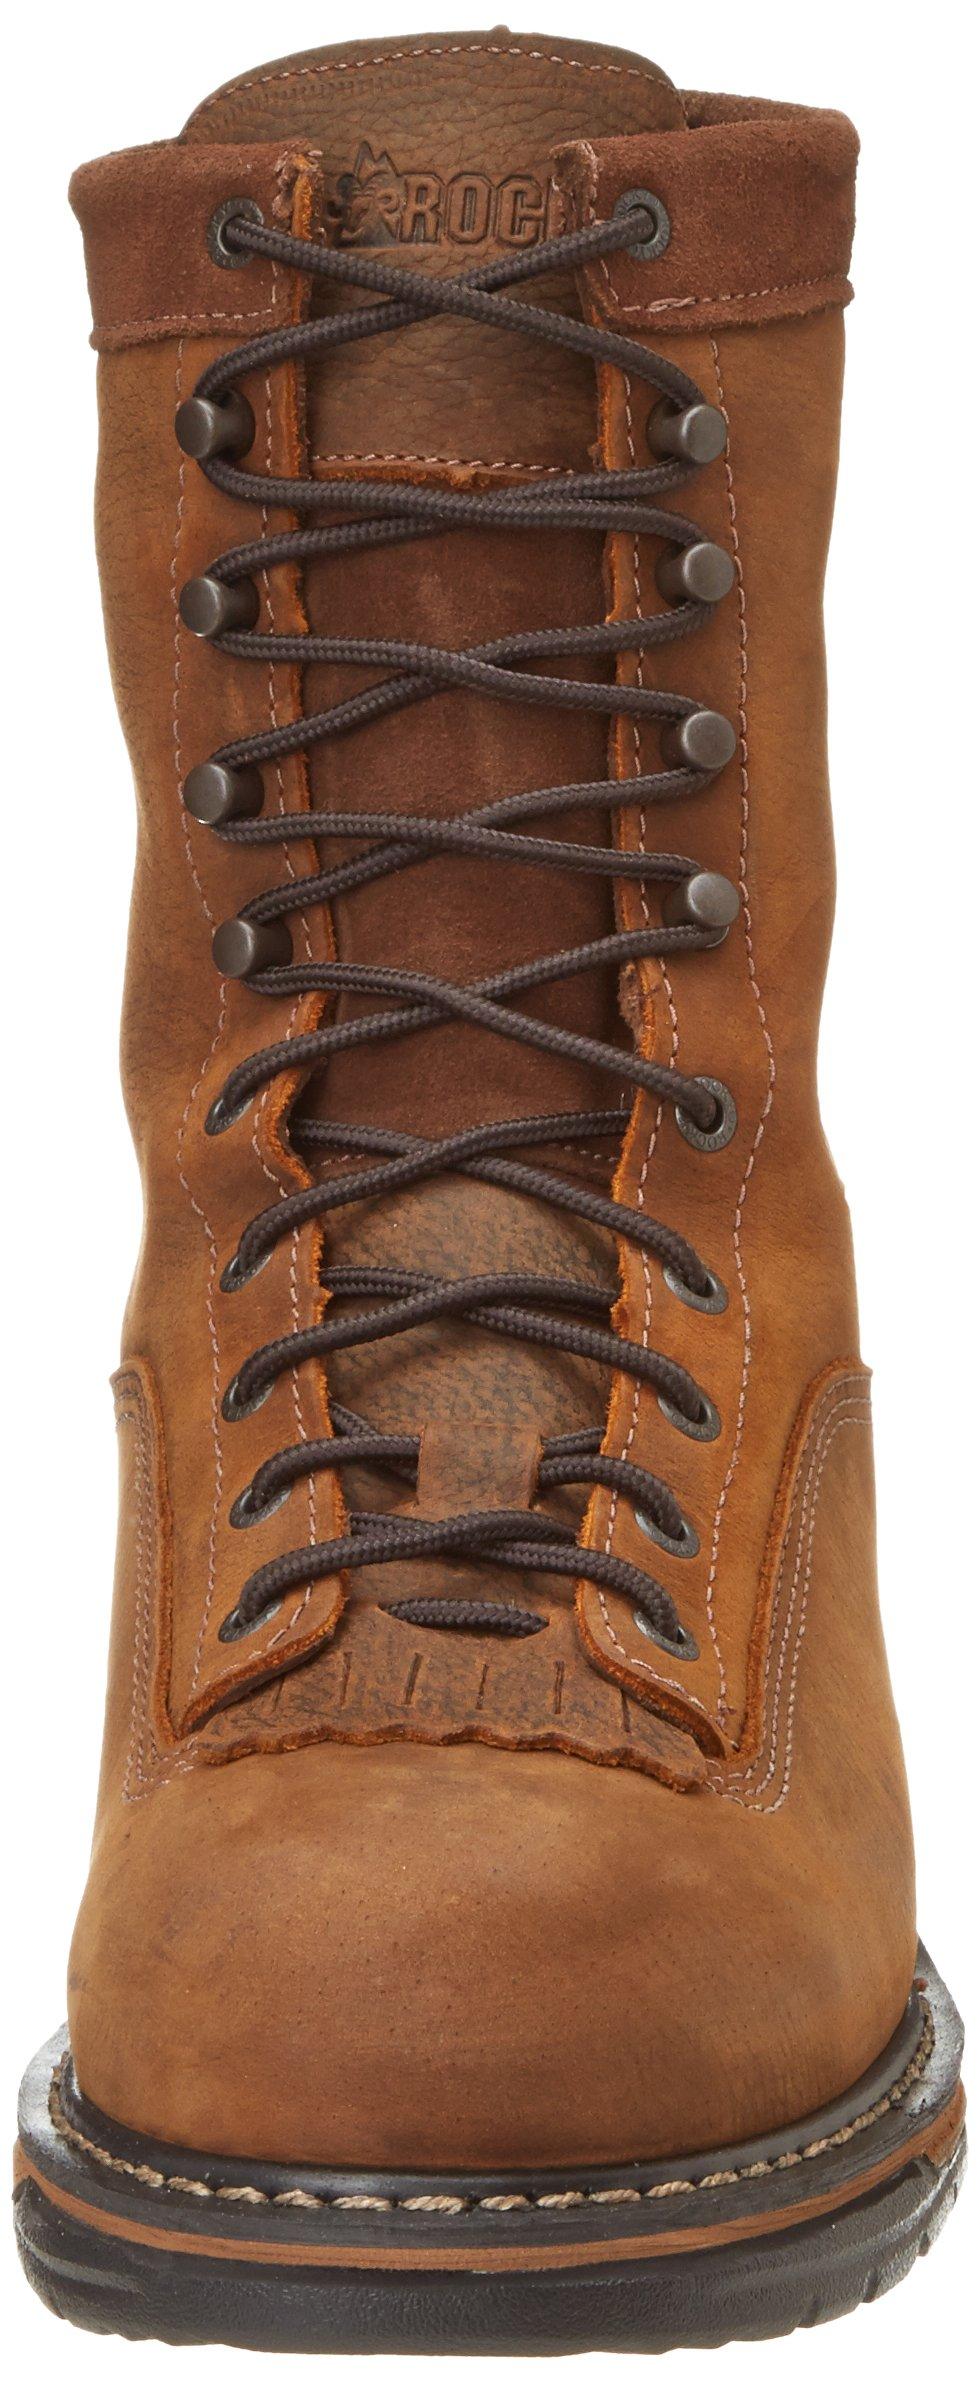 Rocky Men's Iron Clad Eight Inch LTT Steel Toe Work Boot,Brown,13 M US by Rocky (Image #4)